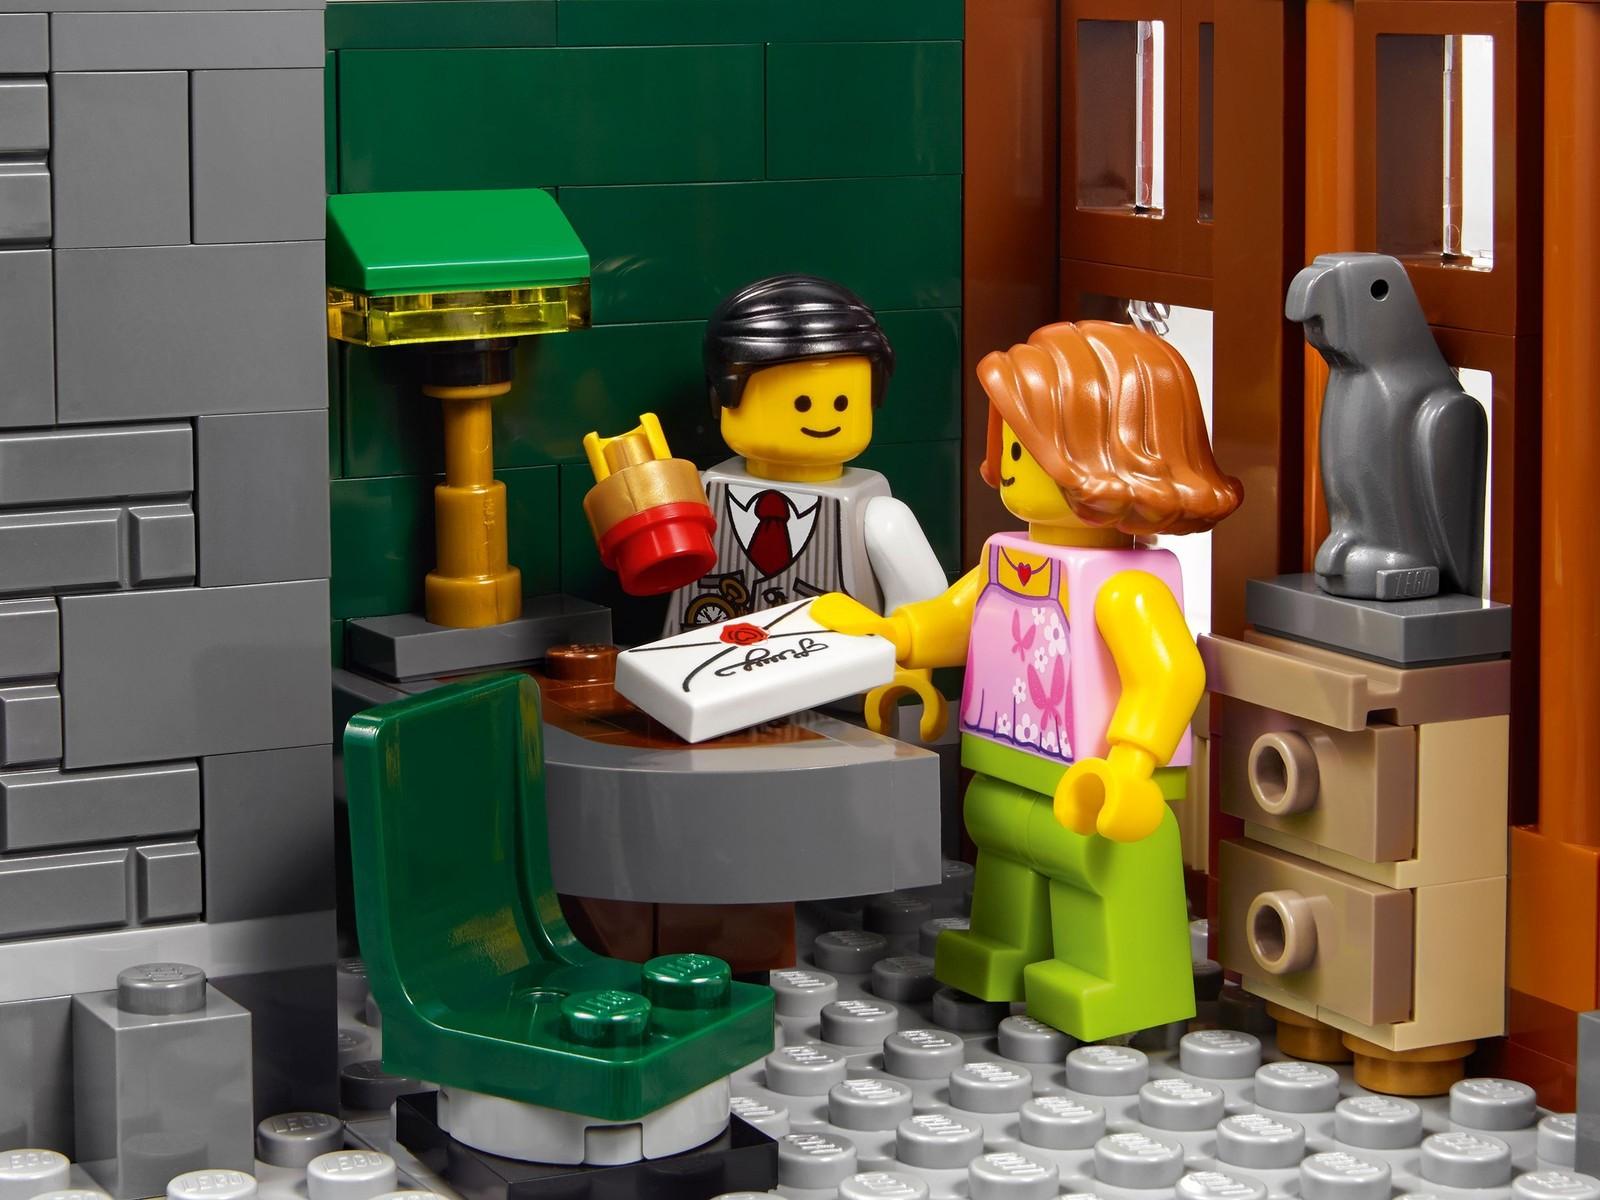 Lego Creator Brick Bank 10251 Toy At Mighty Ape Nz